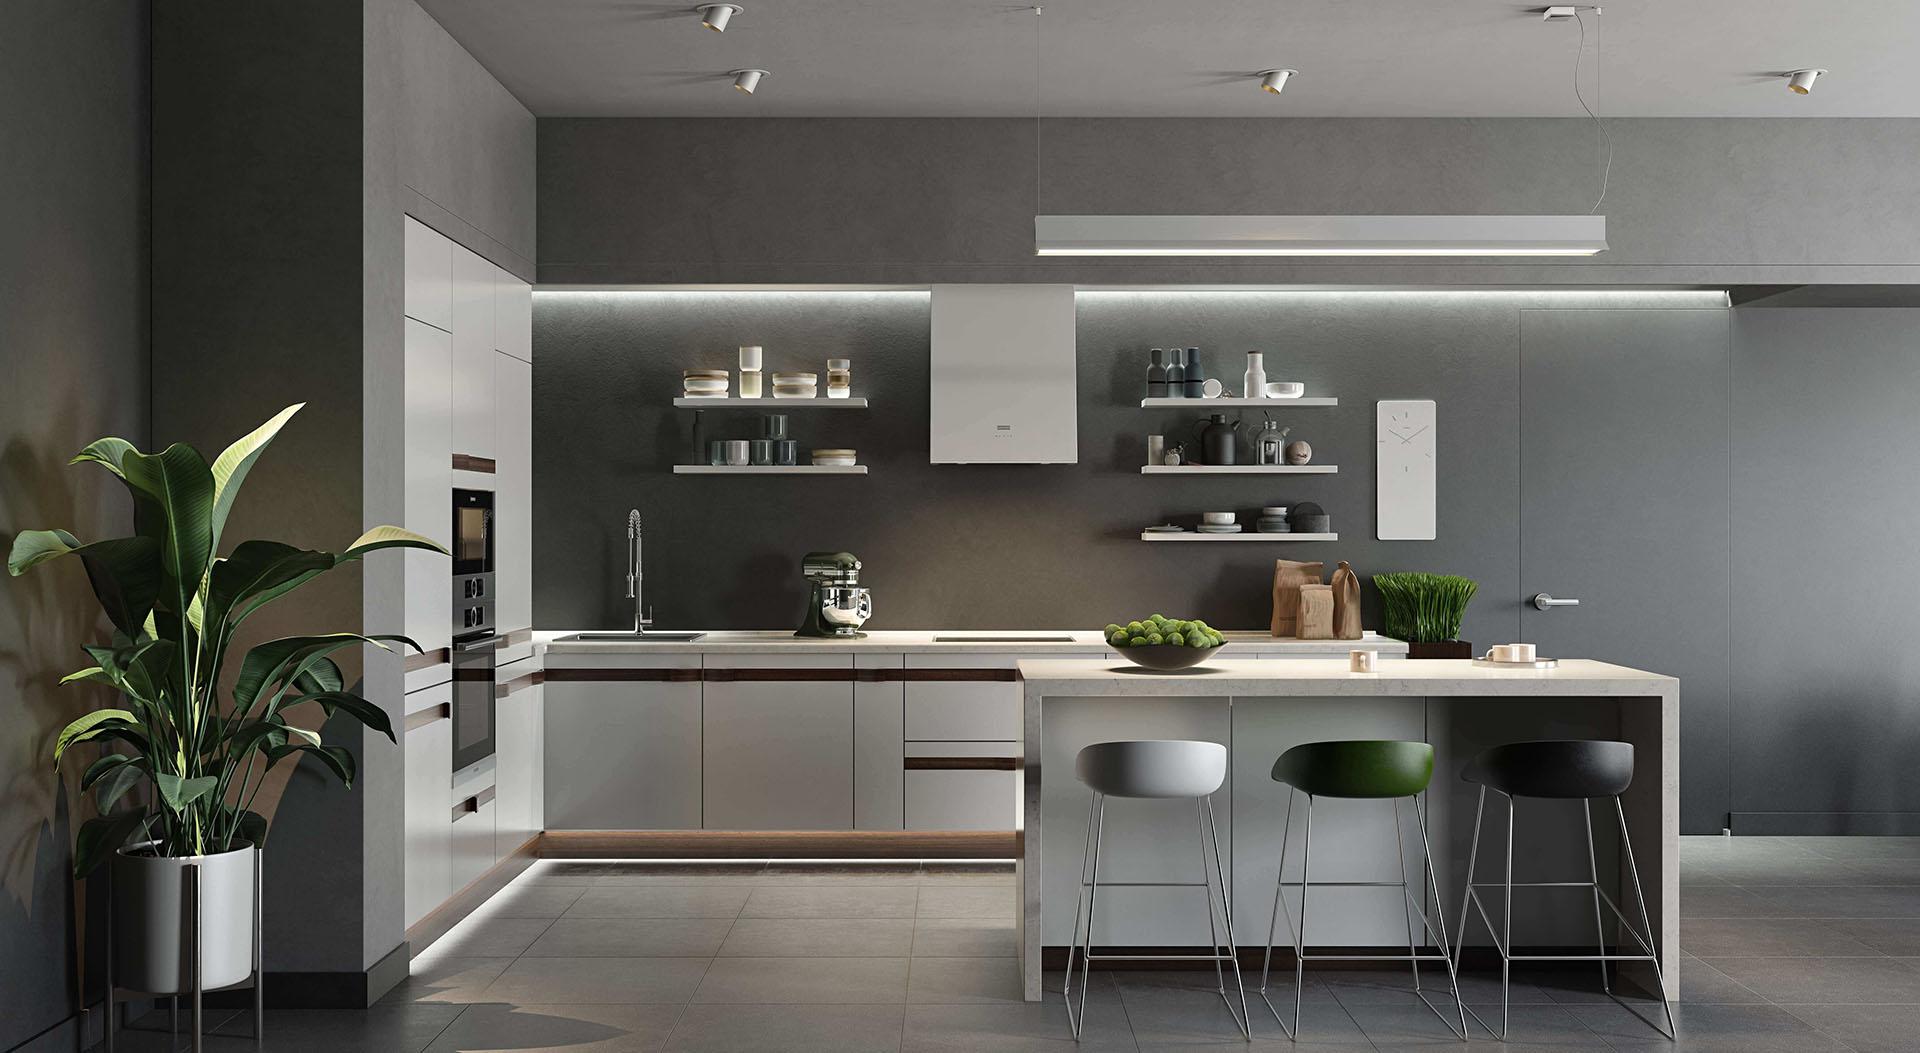 3D Interior Visualization of a Beautiful Kitchen